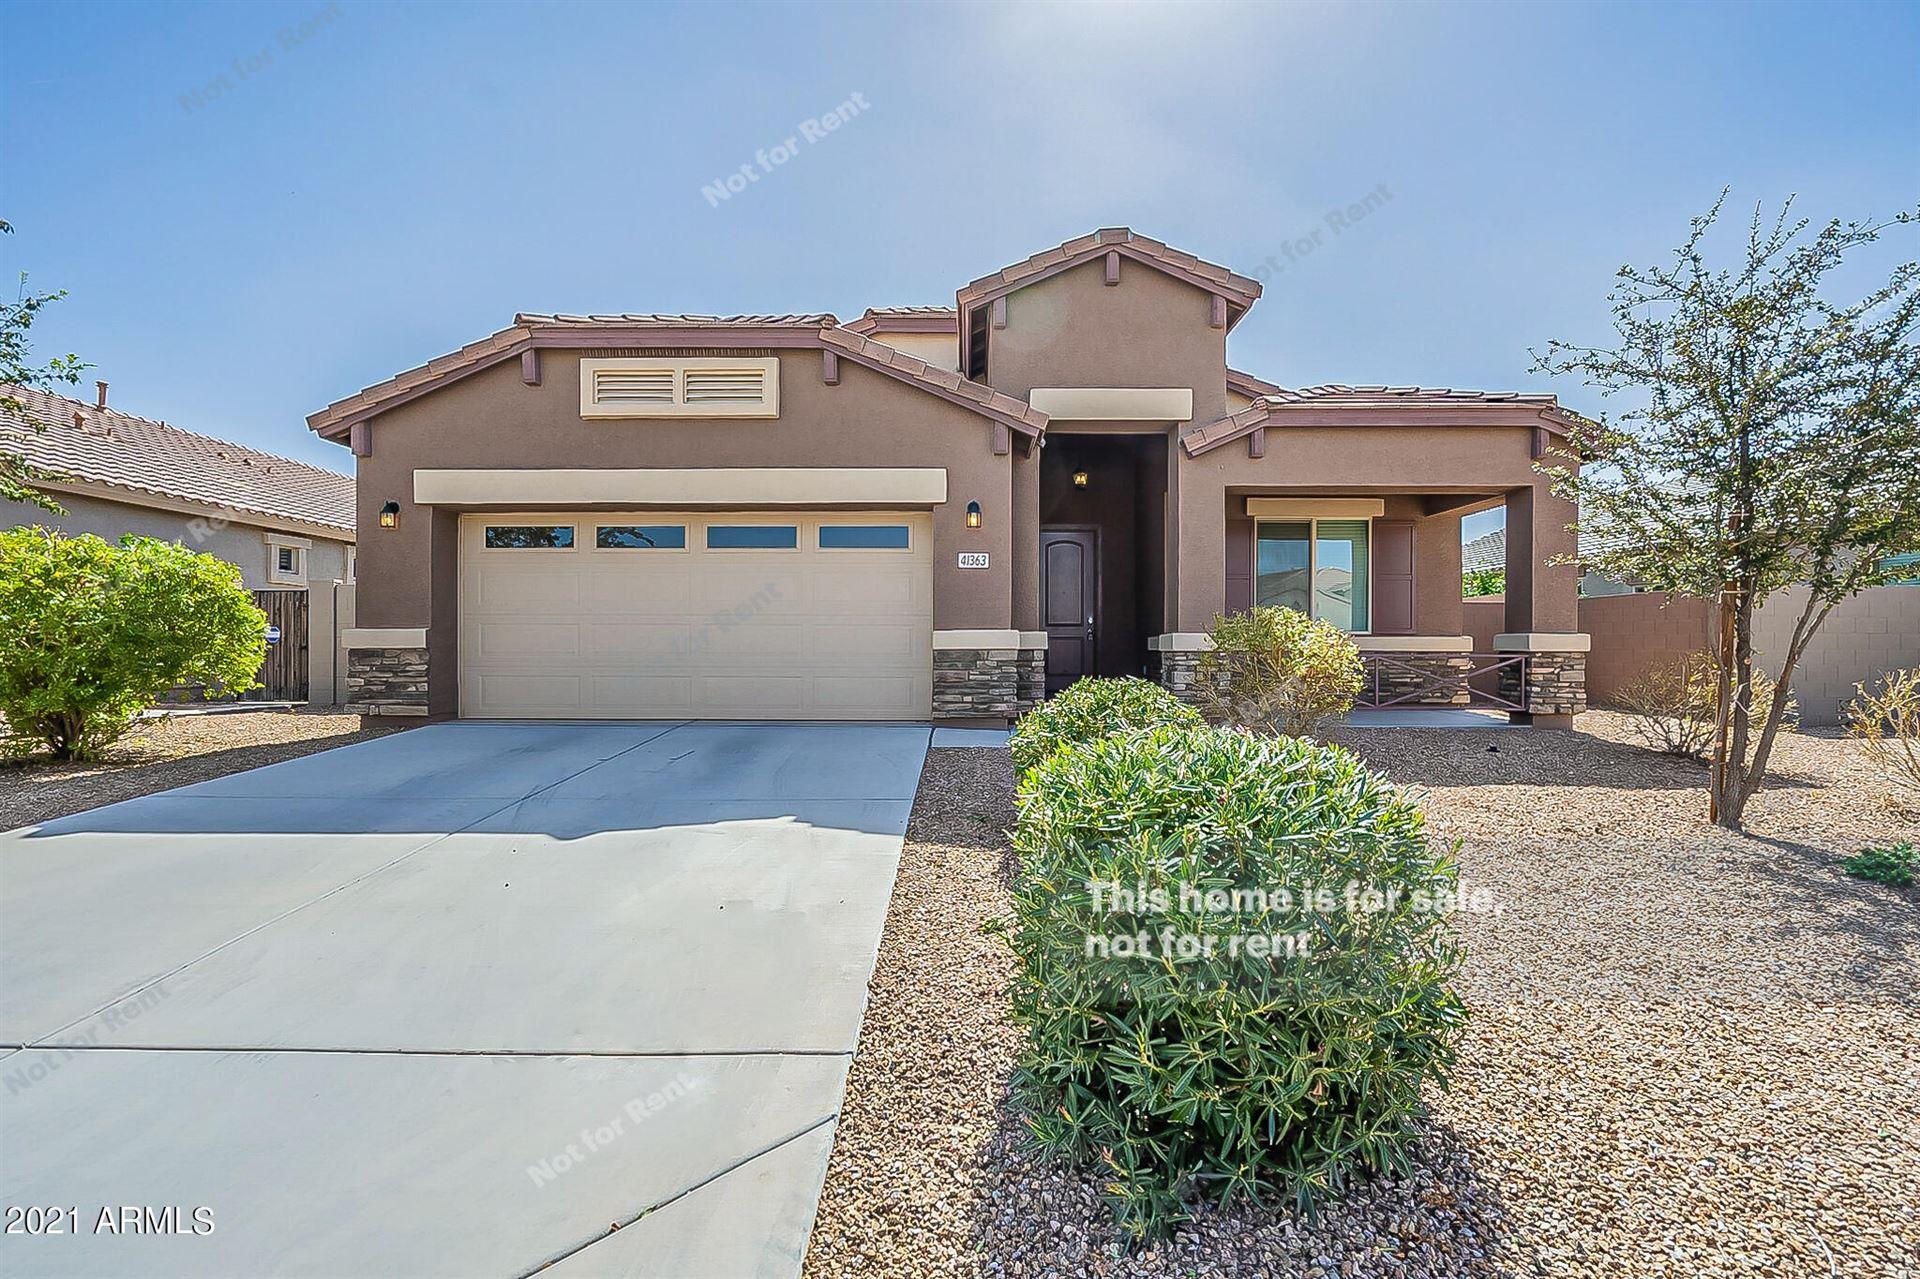 Photo of 41363 W GANLEY Way, Maricopa, AZ 85138 (MLS # 6306824)